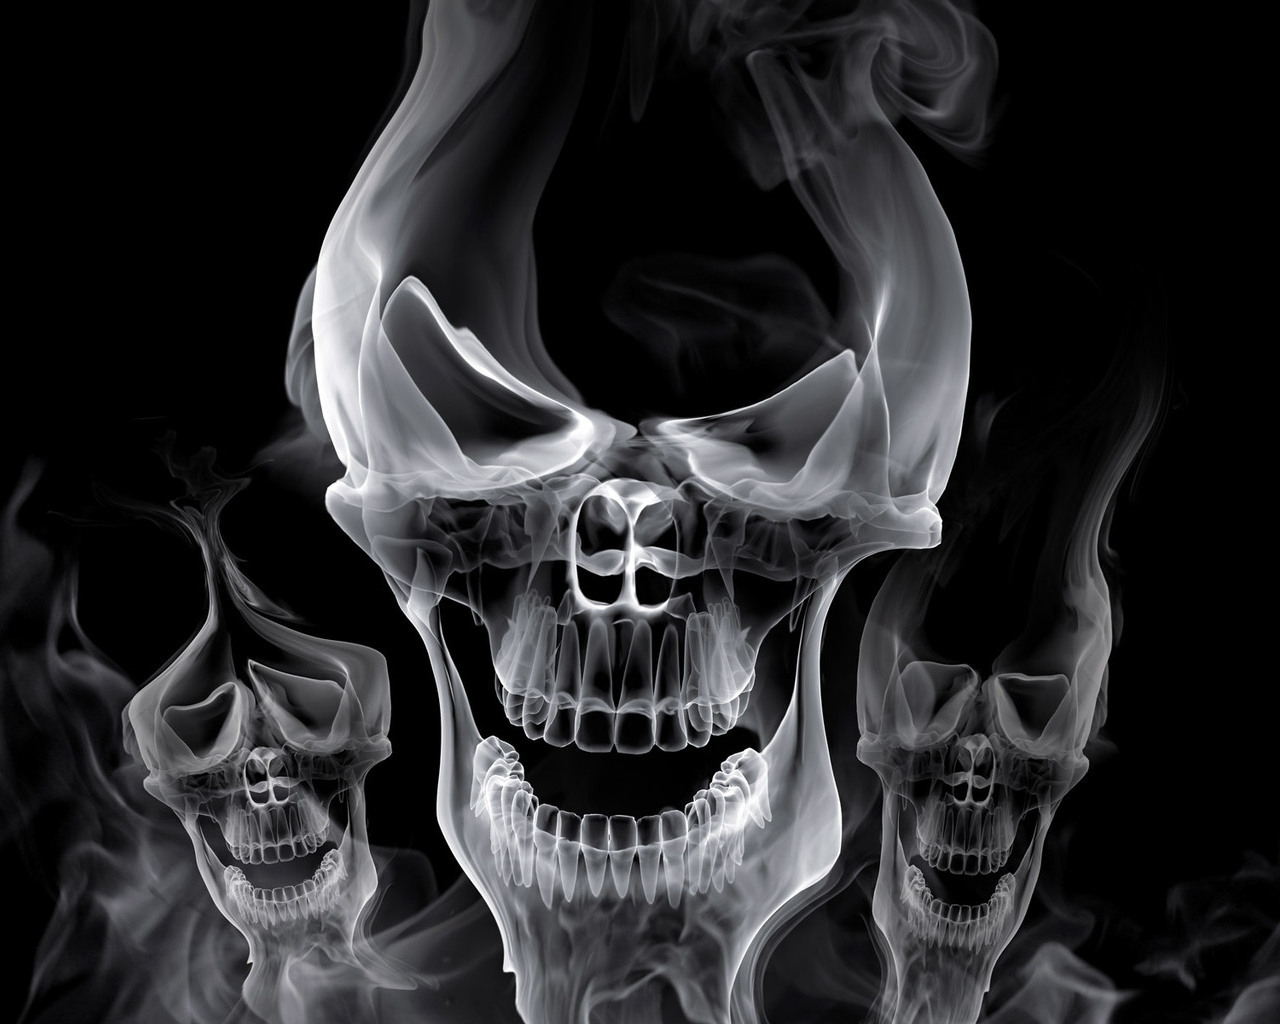 Skulls wallpapers abhi wallpapers - Skeleton wallpaper ...